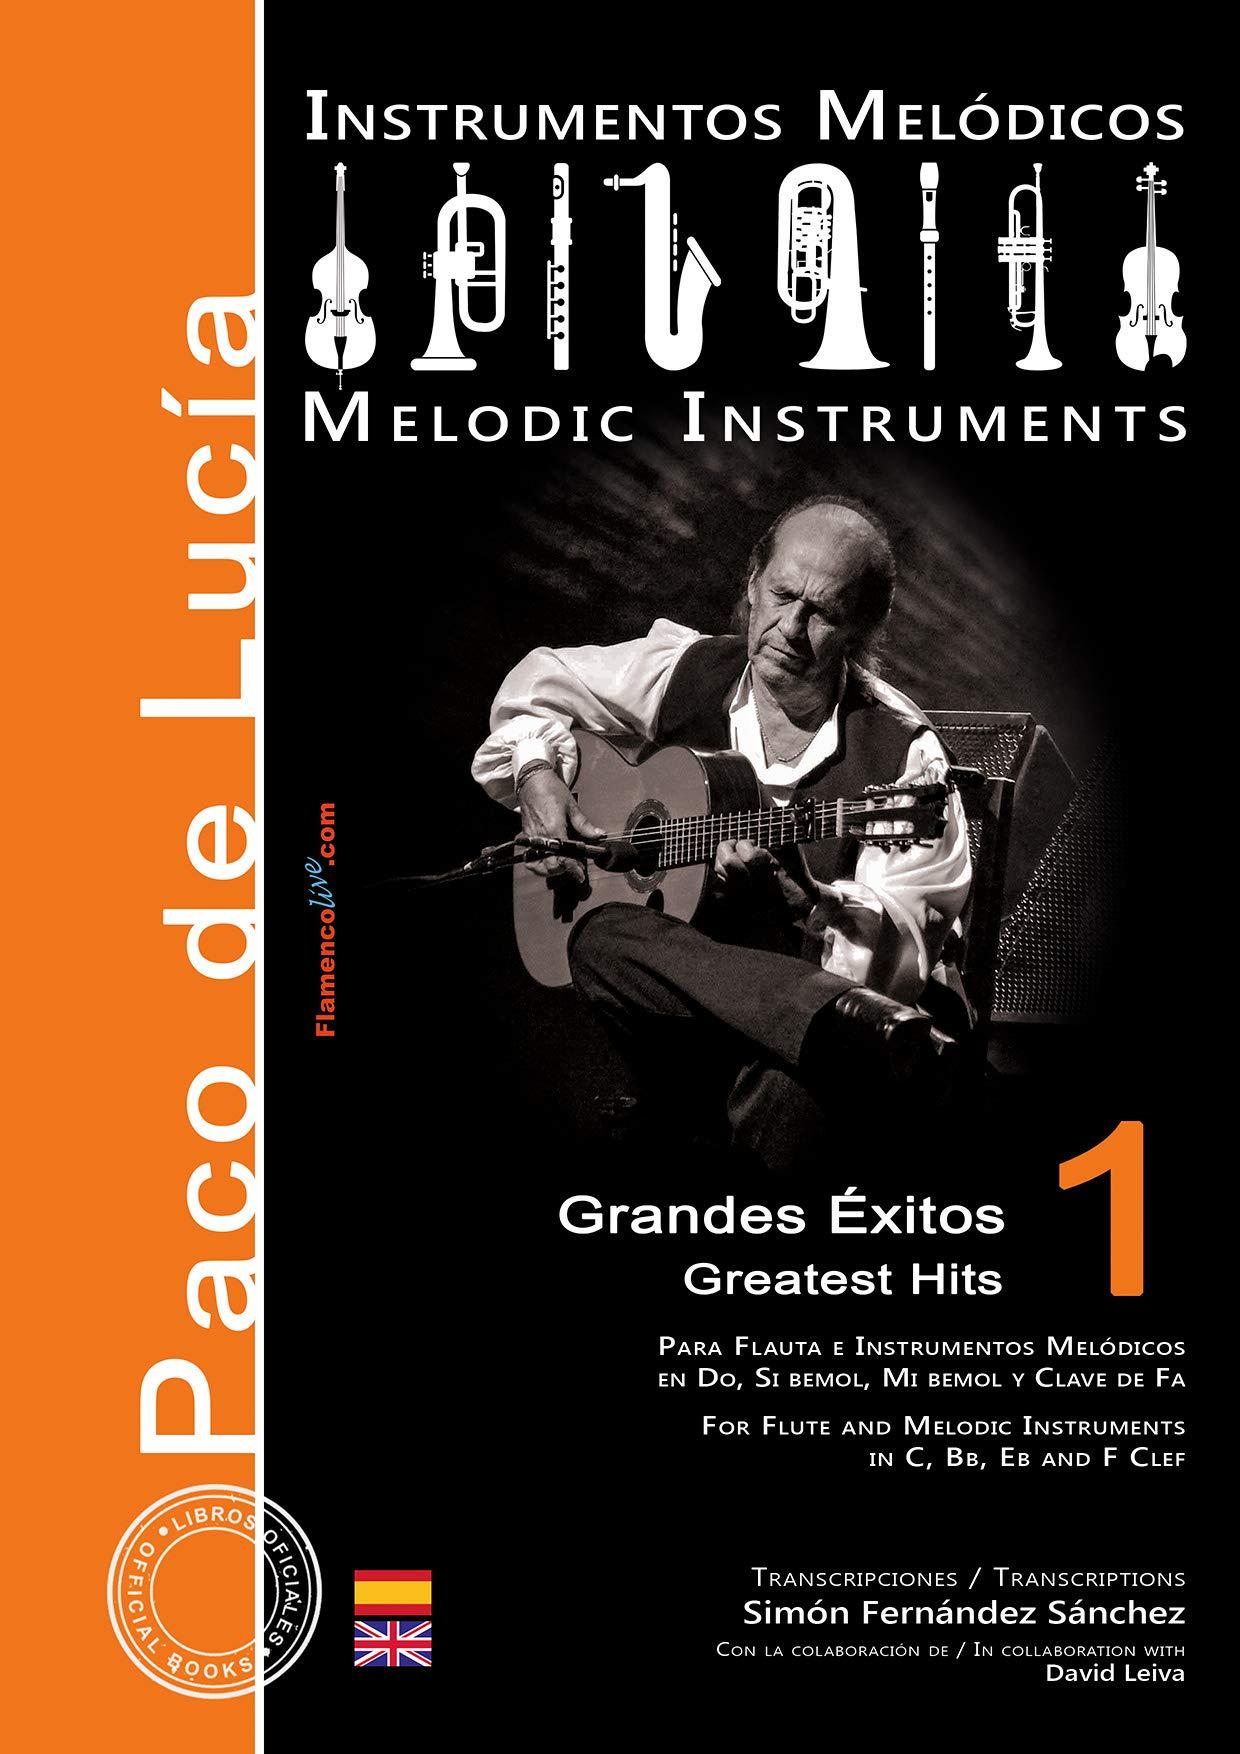 Grandes éxitos de Paco de Lucía para Instrumentos Melódicos Vol.1 ...